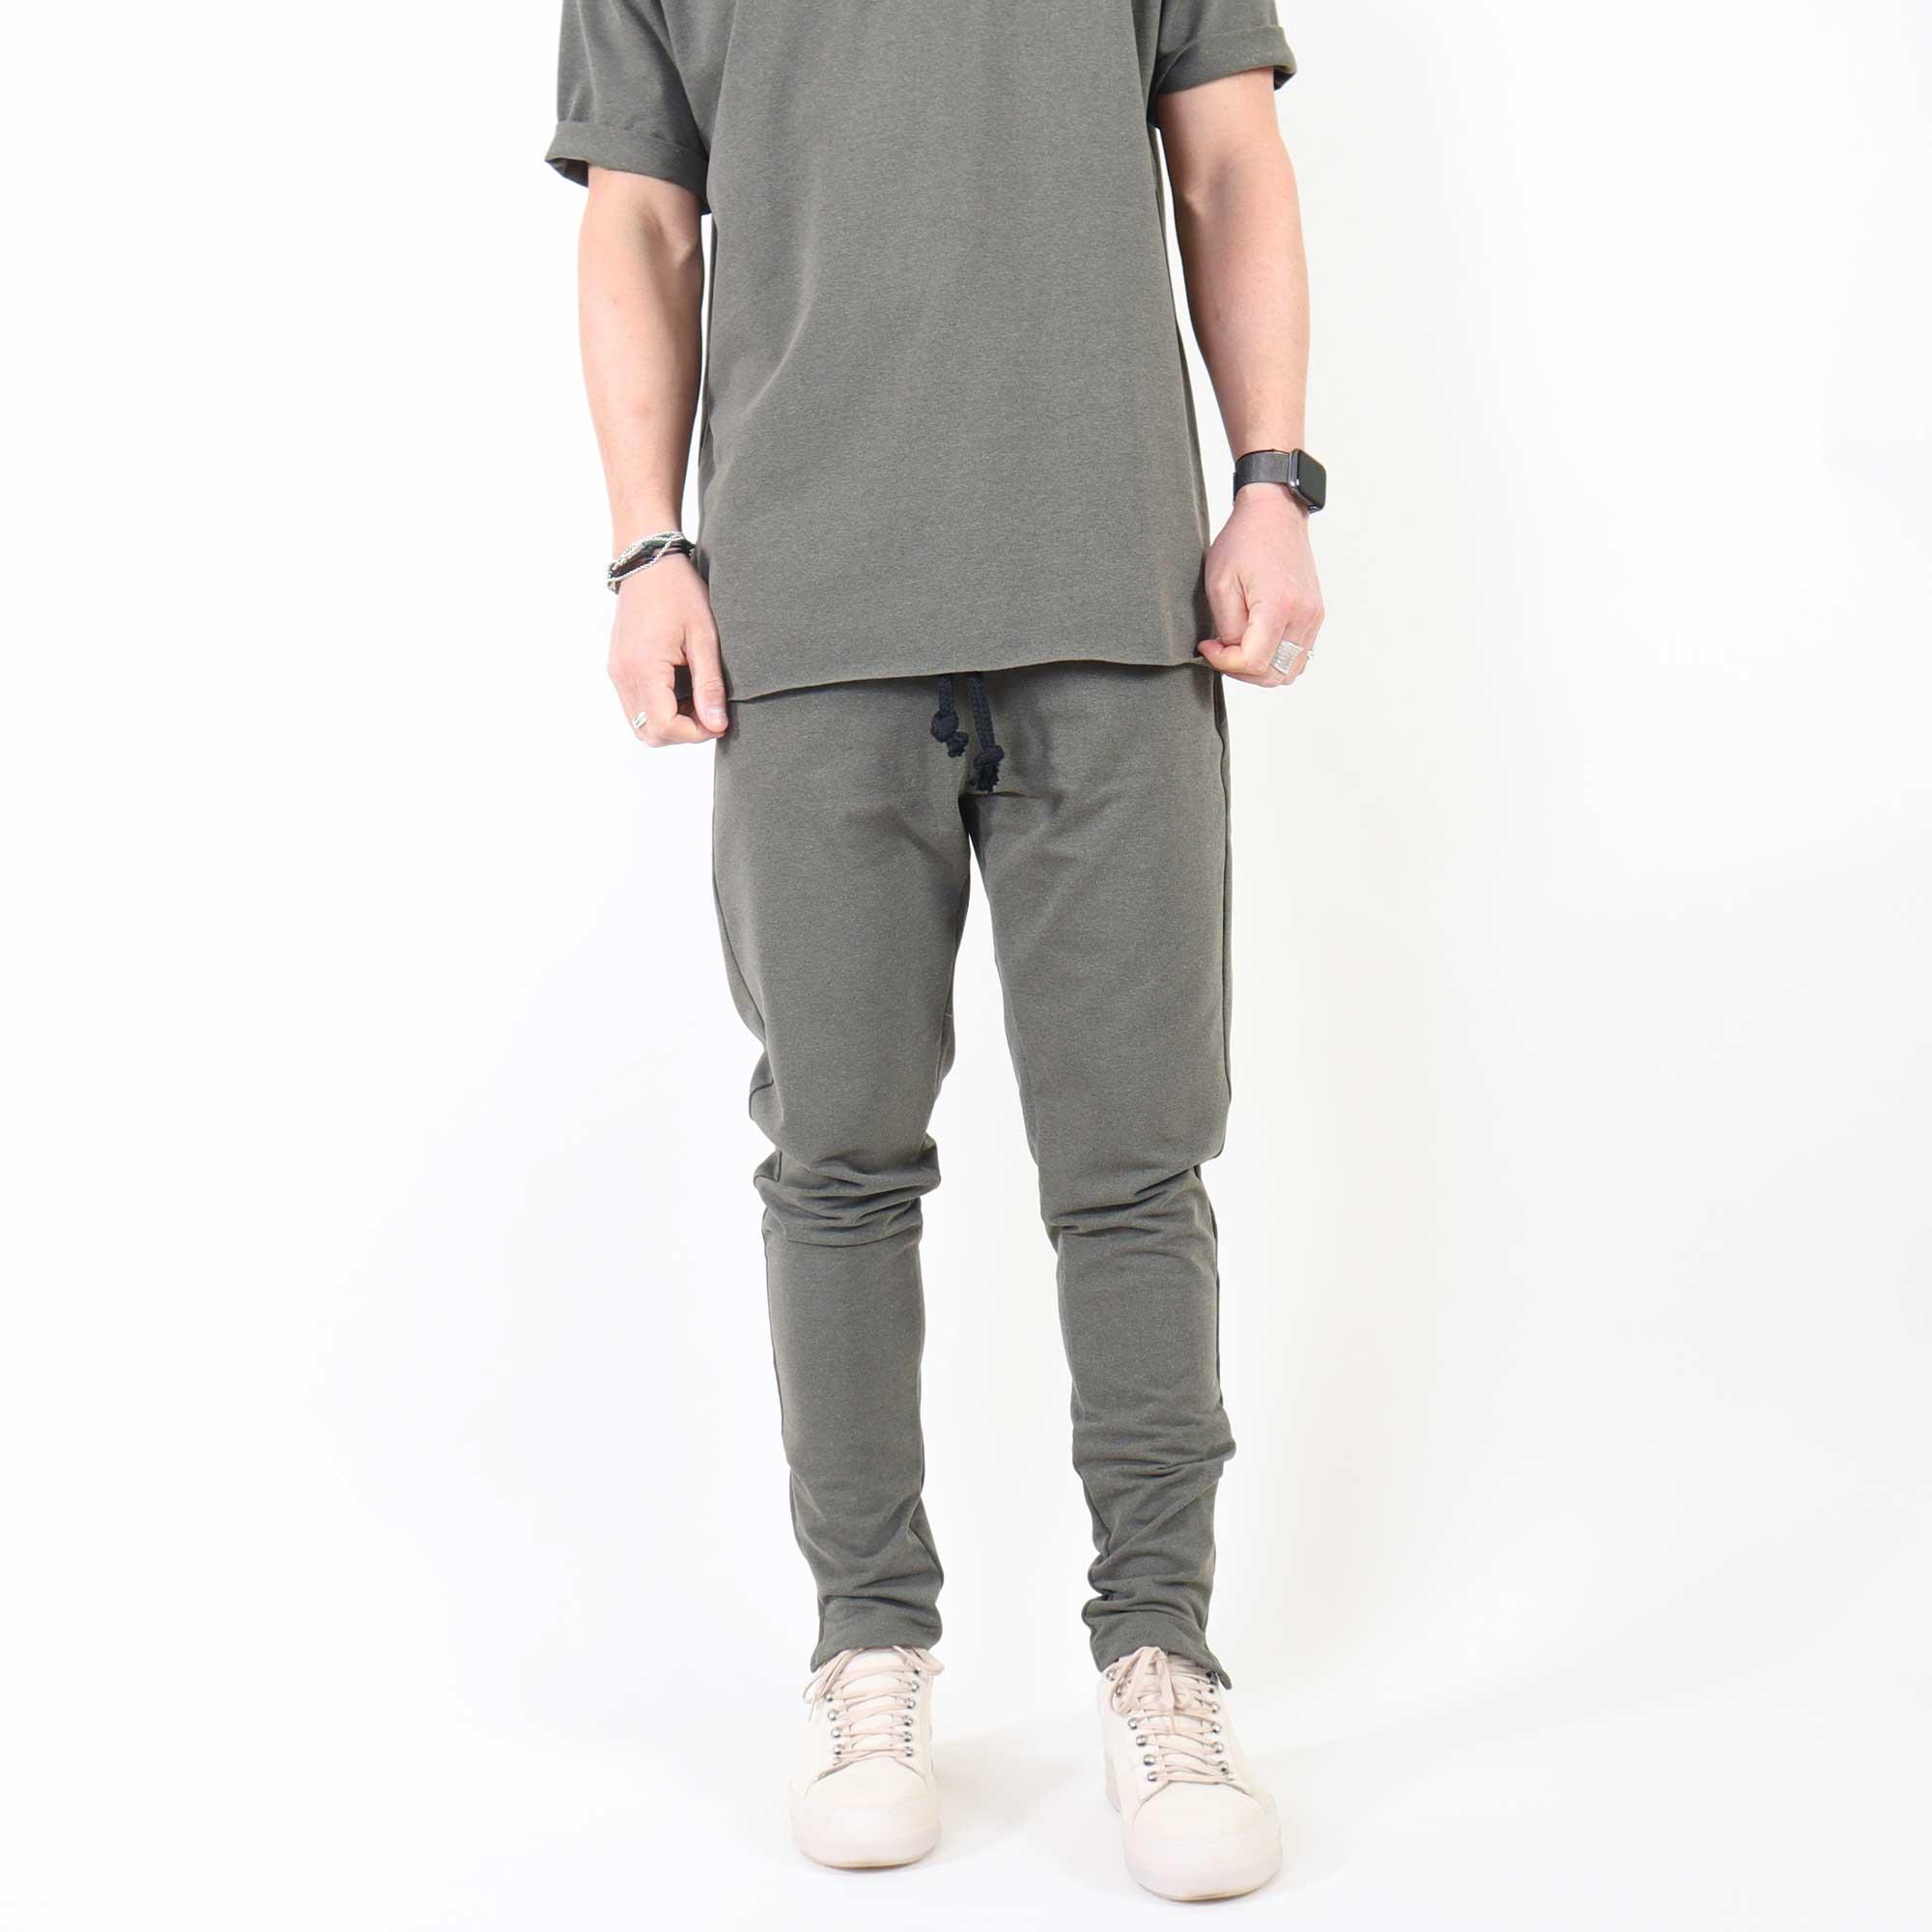 pants-groen-1